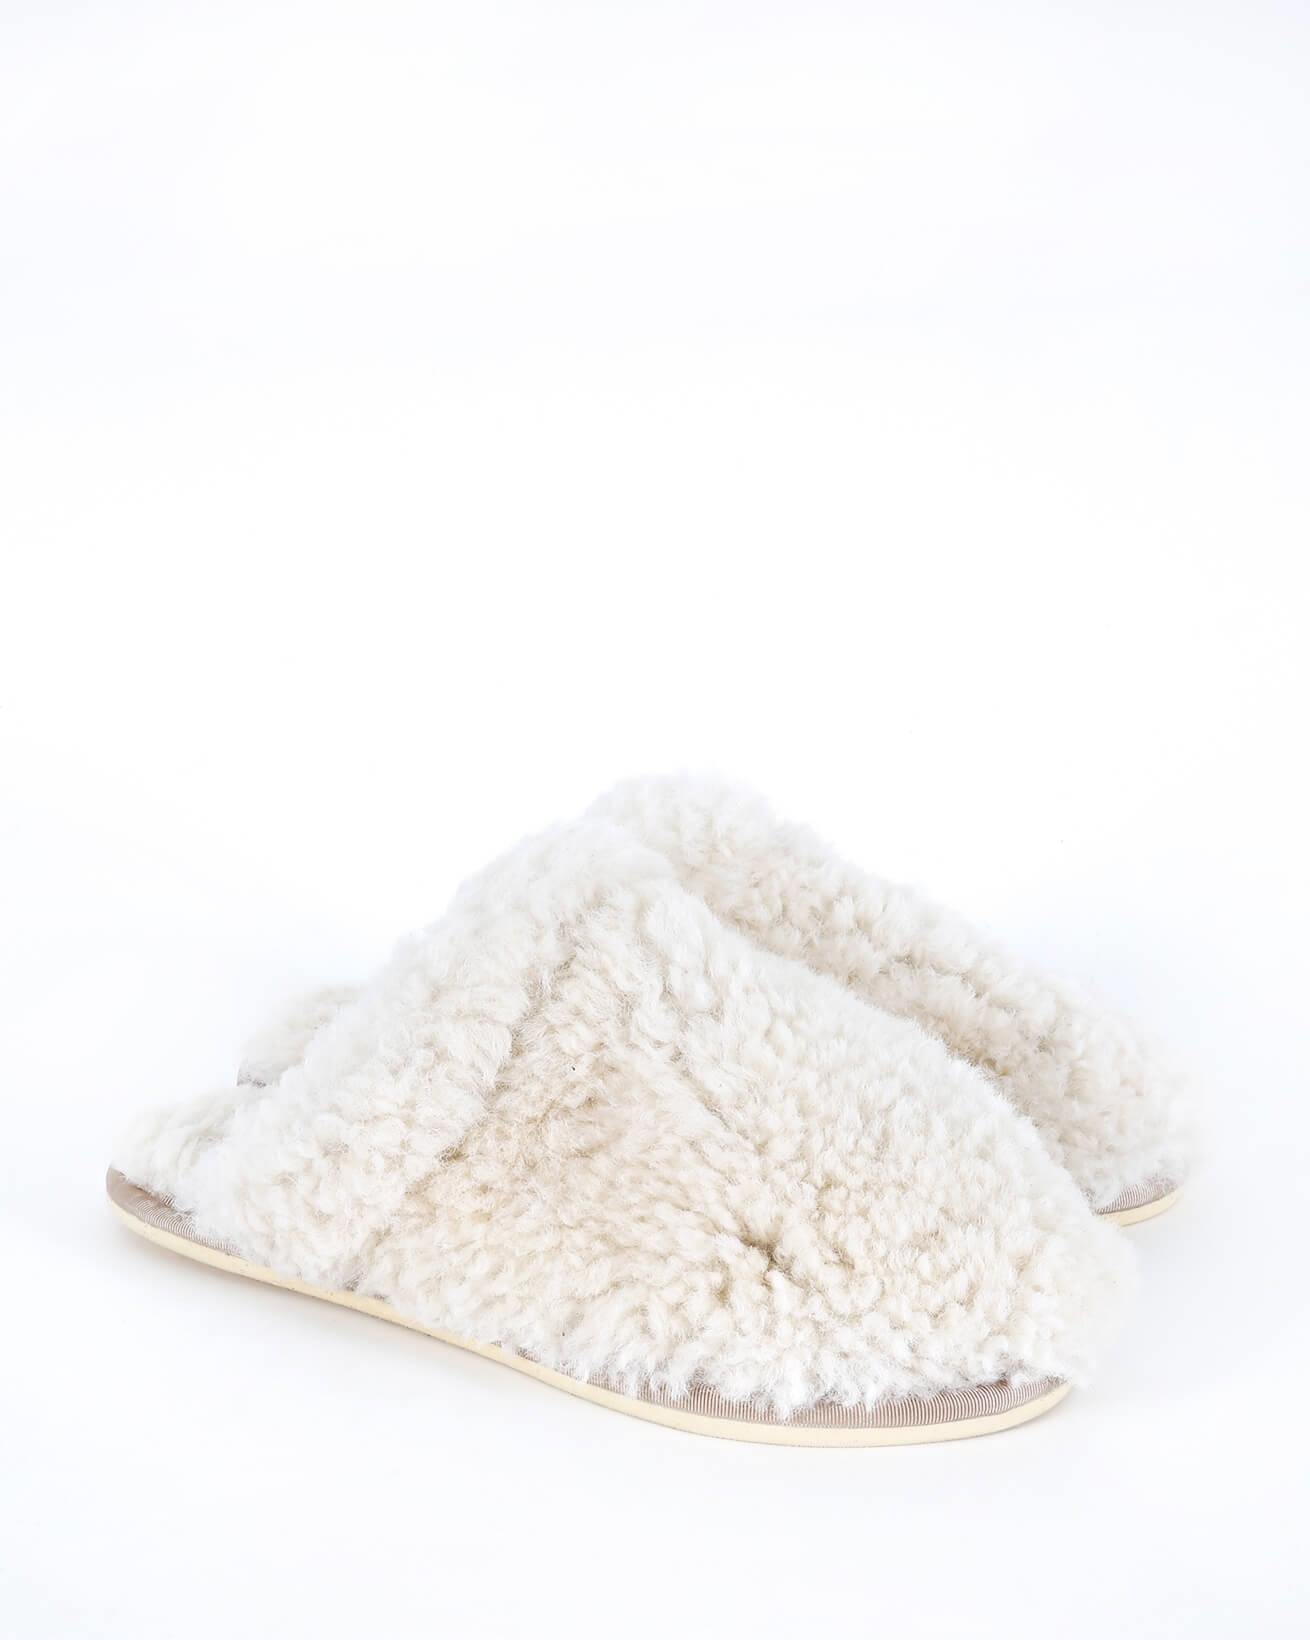 Sheepskin Mules - Size 6 - Oatmeal - 573